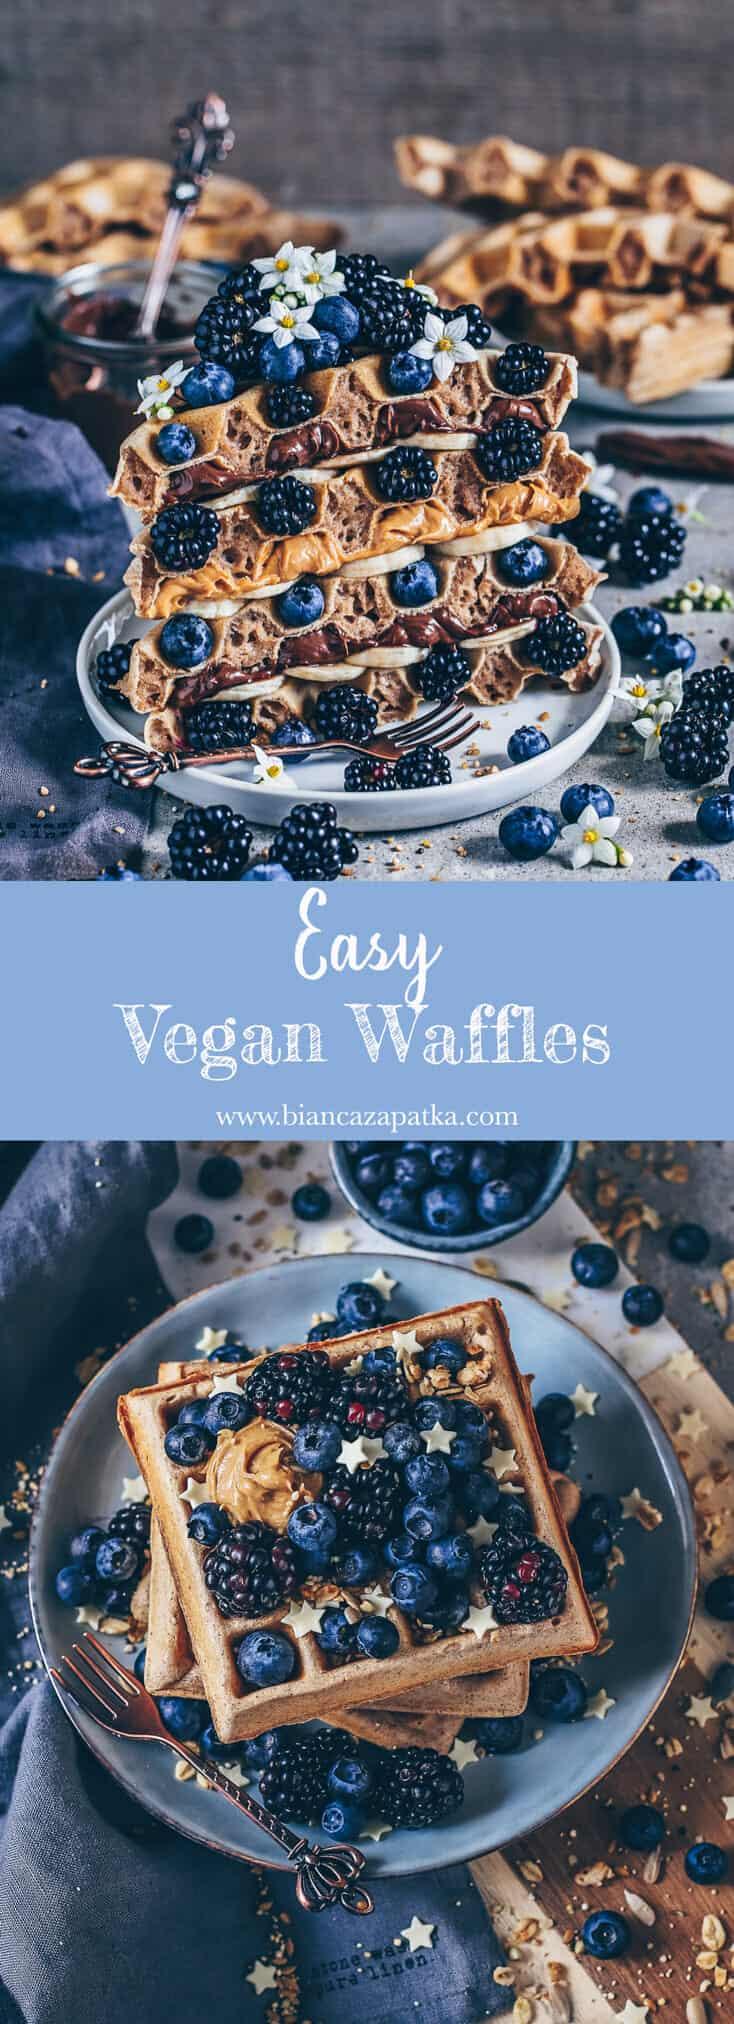 waffles, vegan and easy recipe